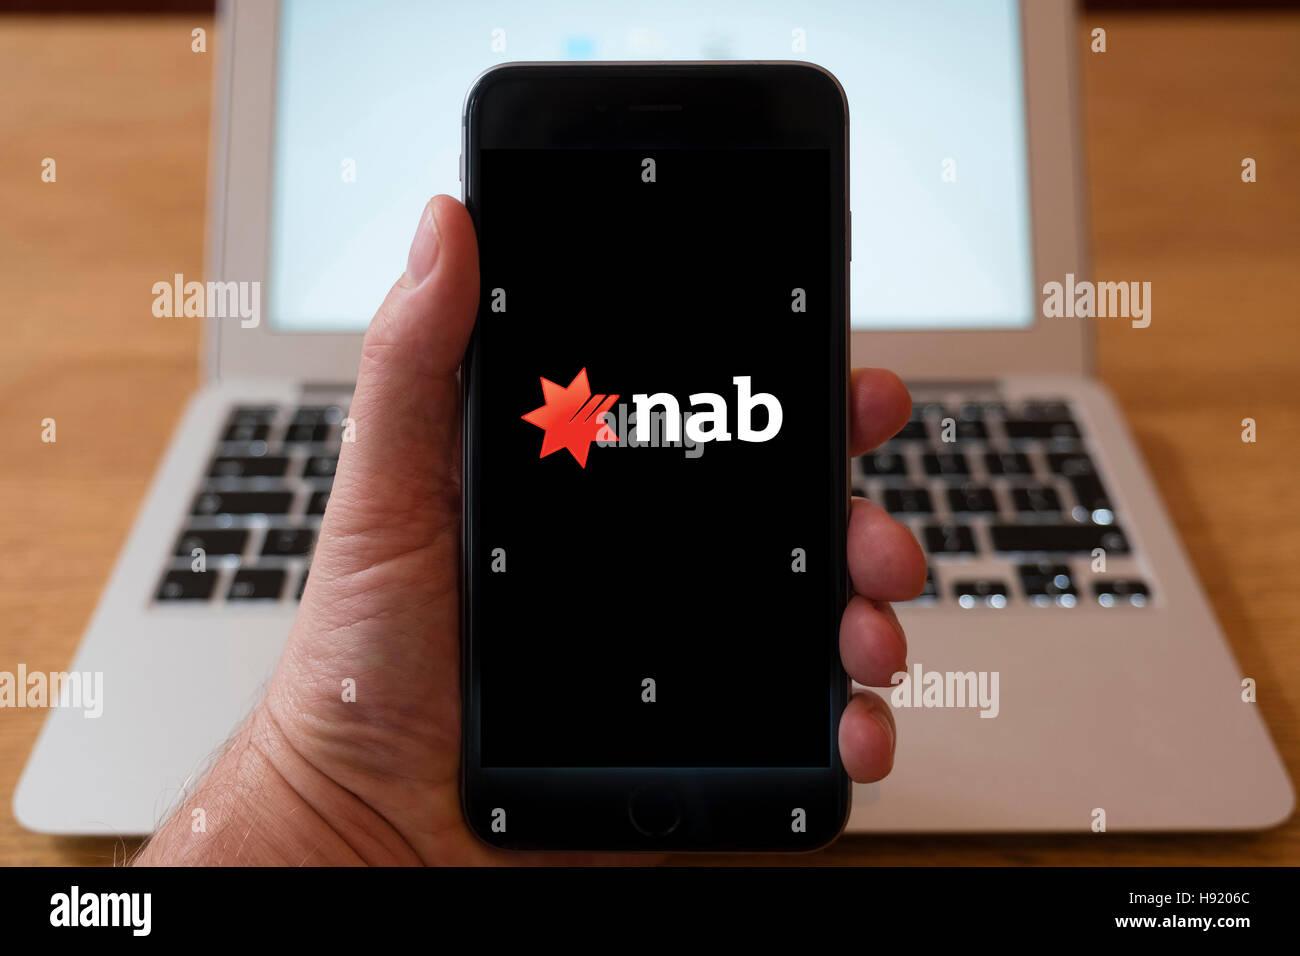 Using iPhone smart phone to display website logo of NAB, National Australia Bank - Stock Image